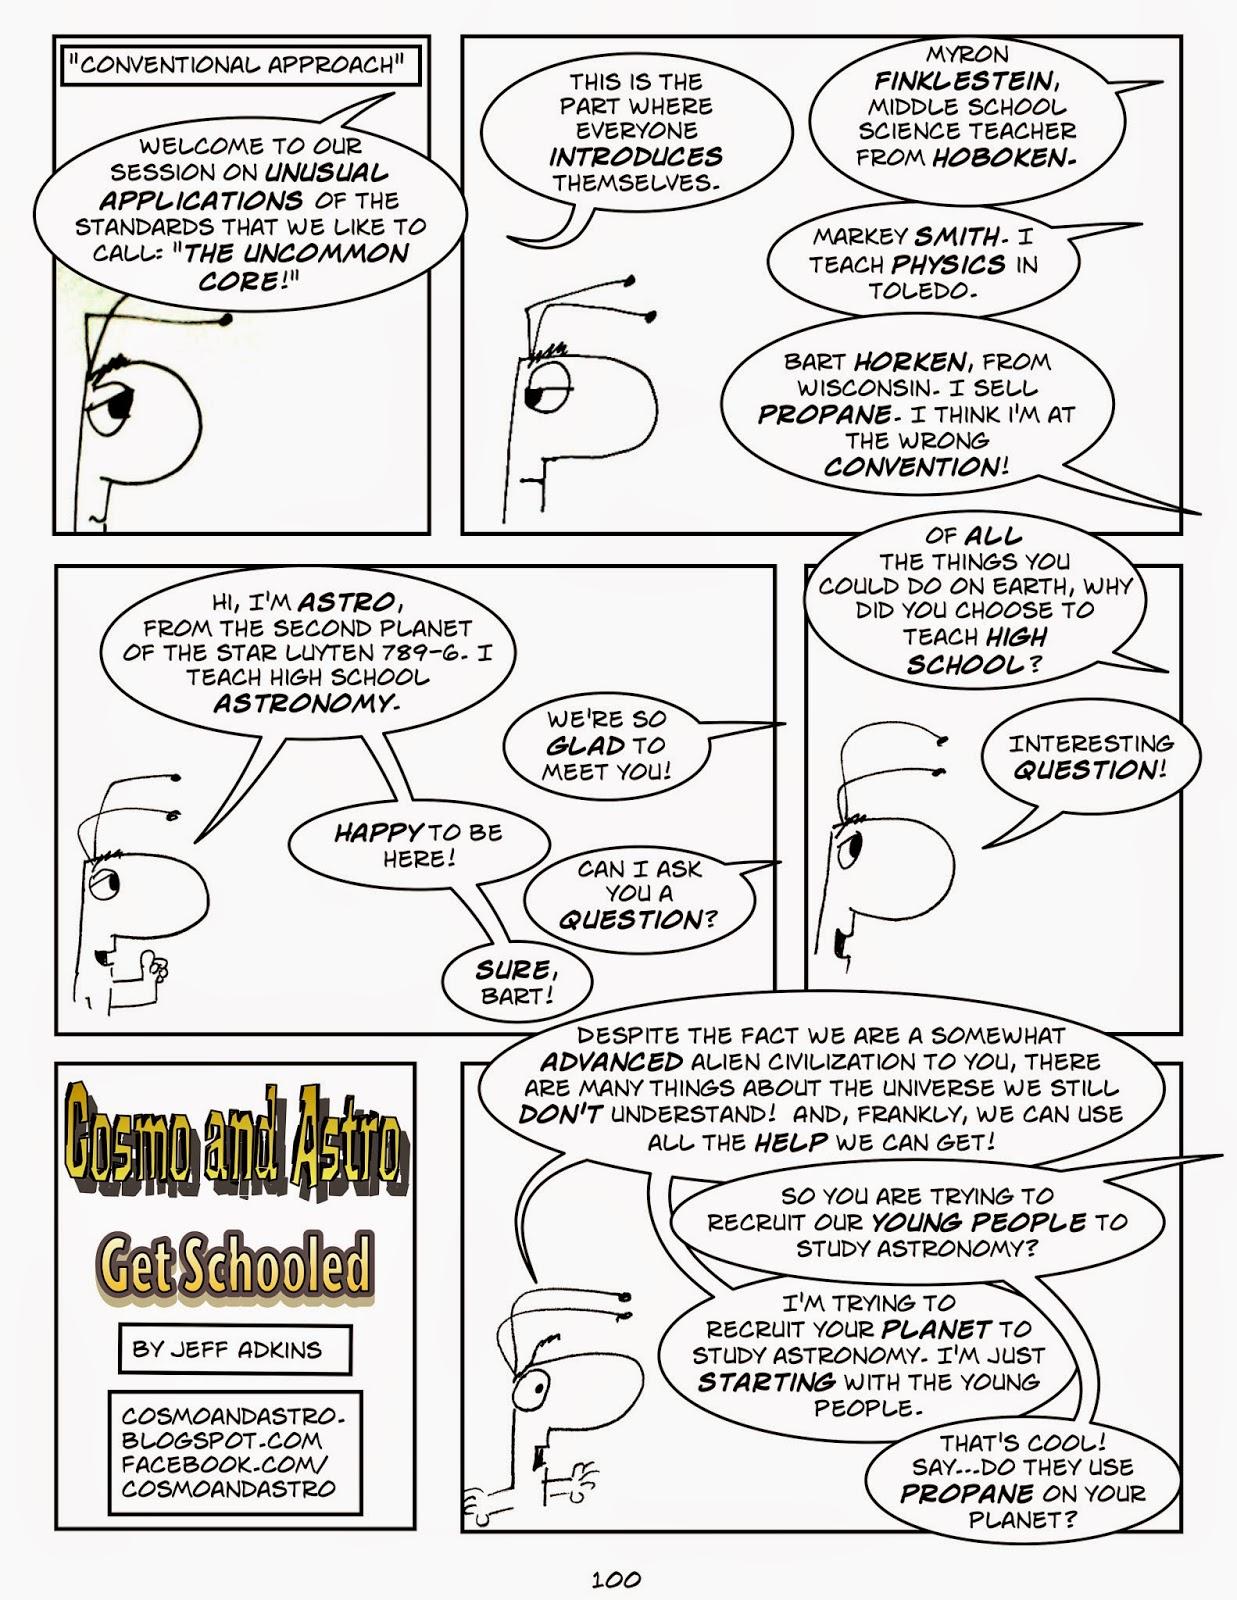 Cosmo and Astro Get Schooled: Episode 100: